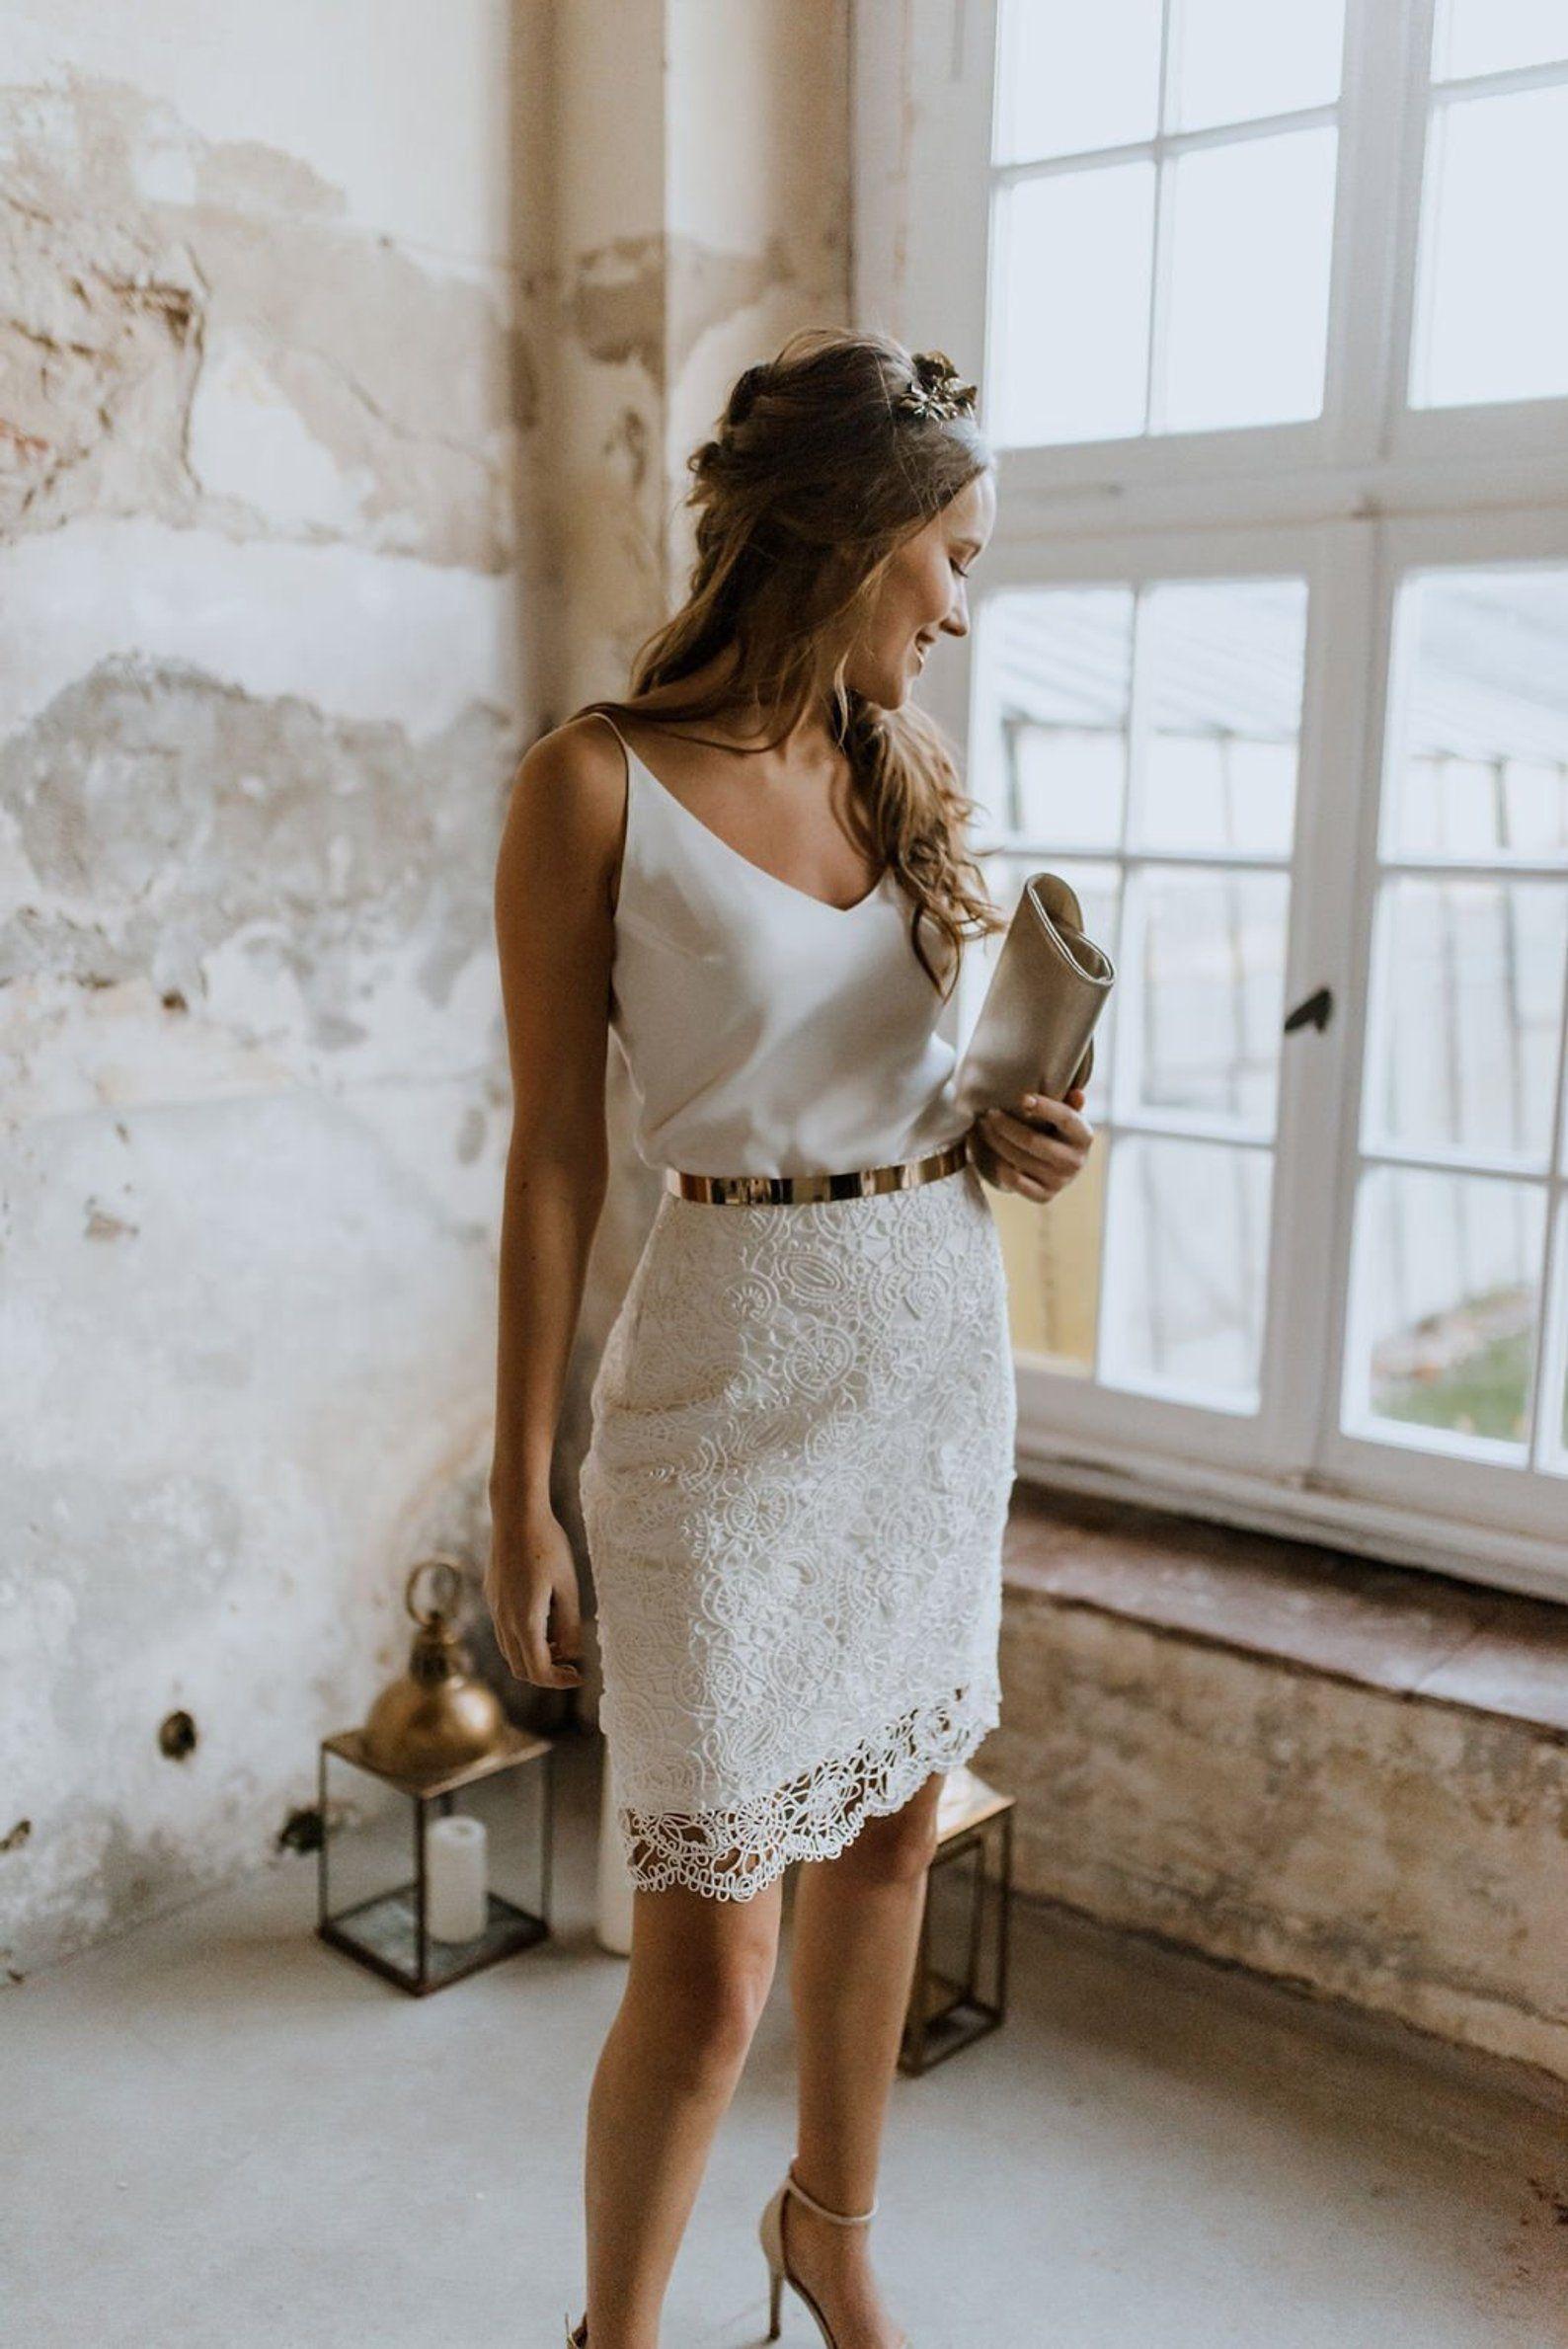 Enges Camisole Top Marnie  Etsy  Couture brautkleider, Brautmode